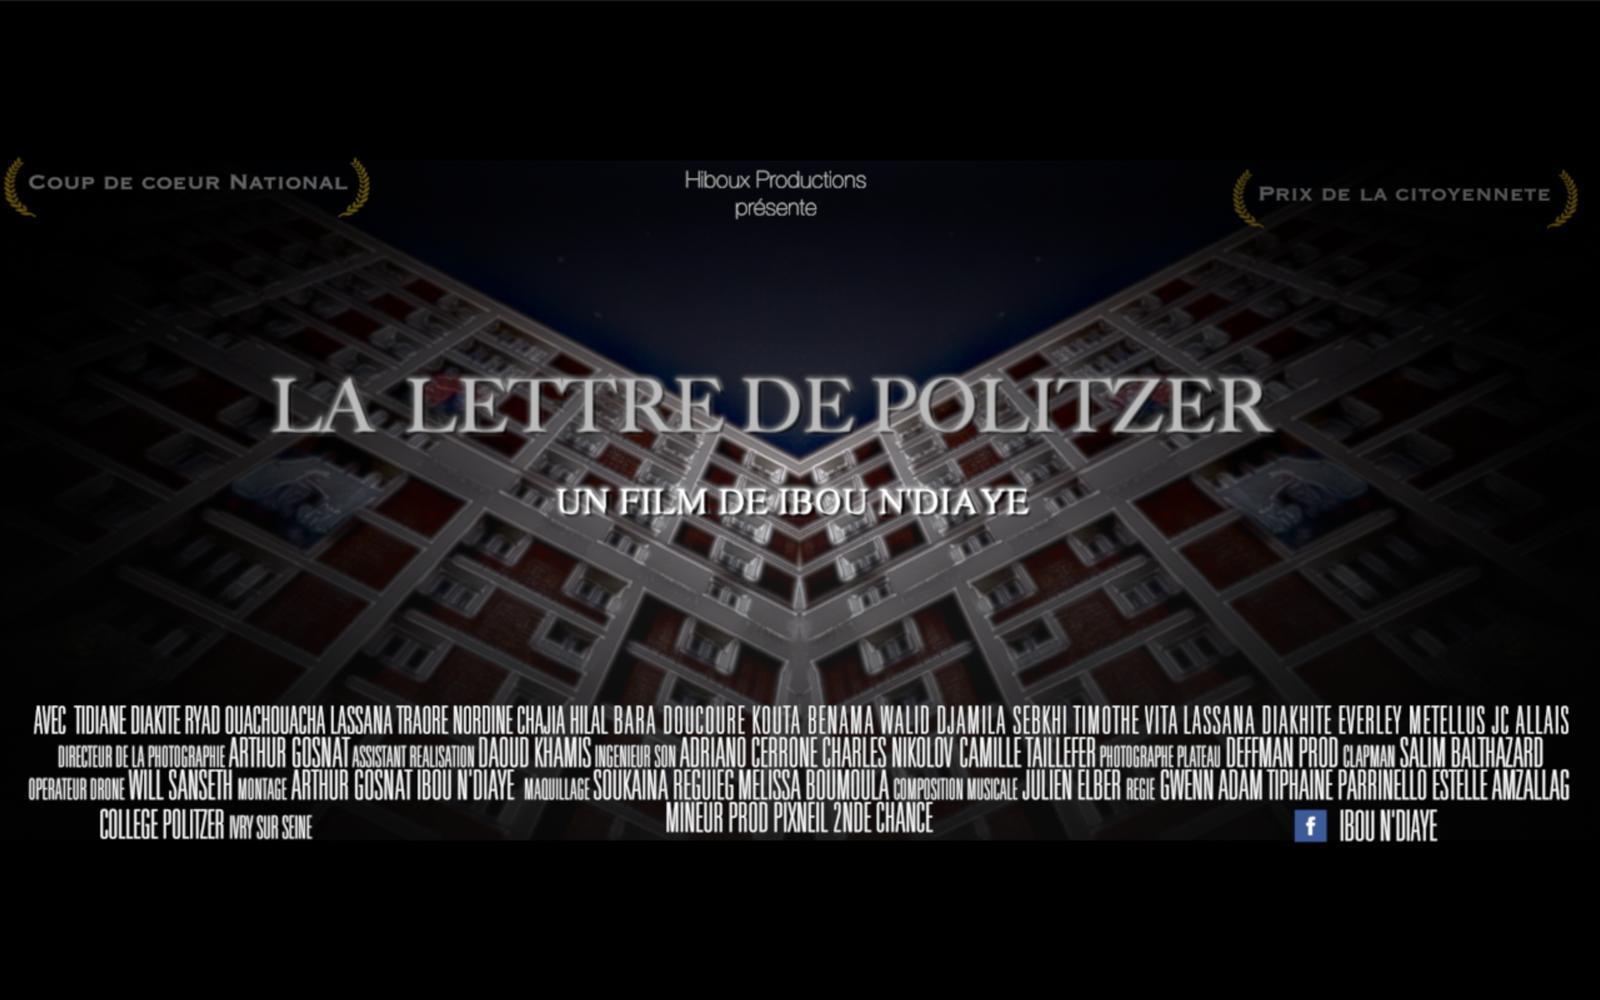 LA LETTRE DE POLITZER